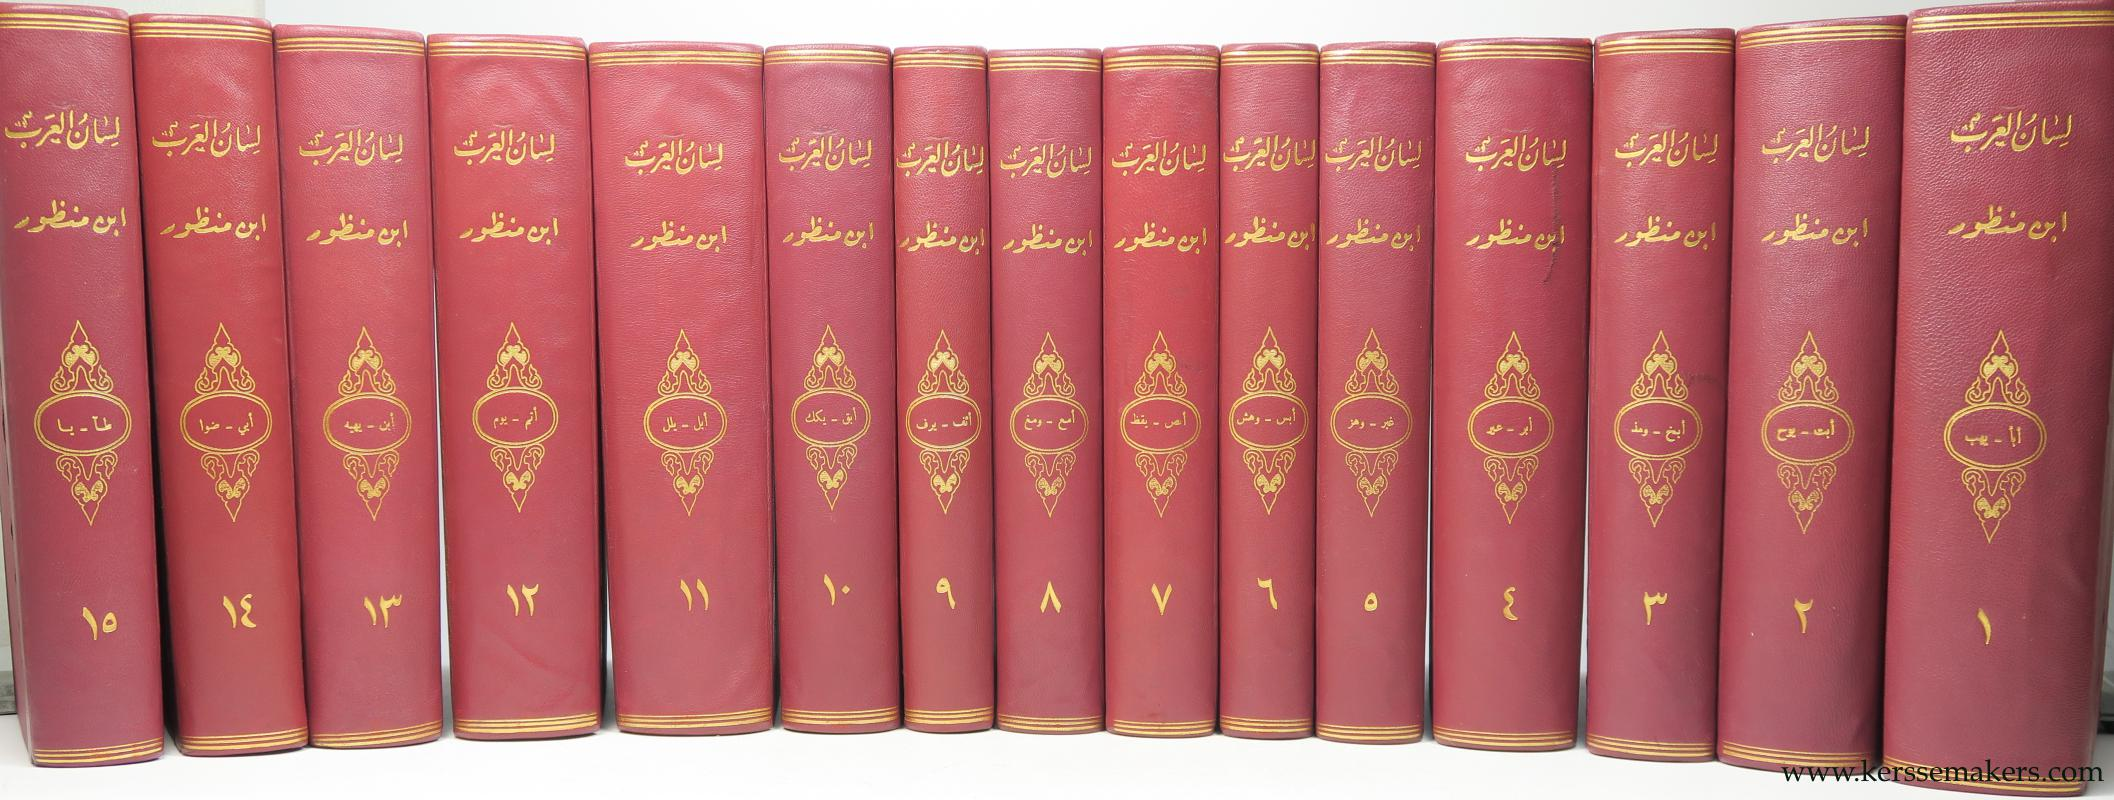 IBN MANZUR - Lisan al 'Arab [ Complete set in 15 volumes ] 'Second edition edited in Beirut by Dar Beirut and Dar Sader'.